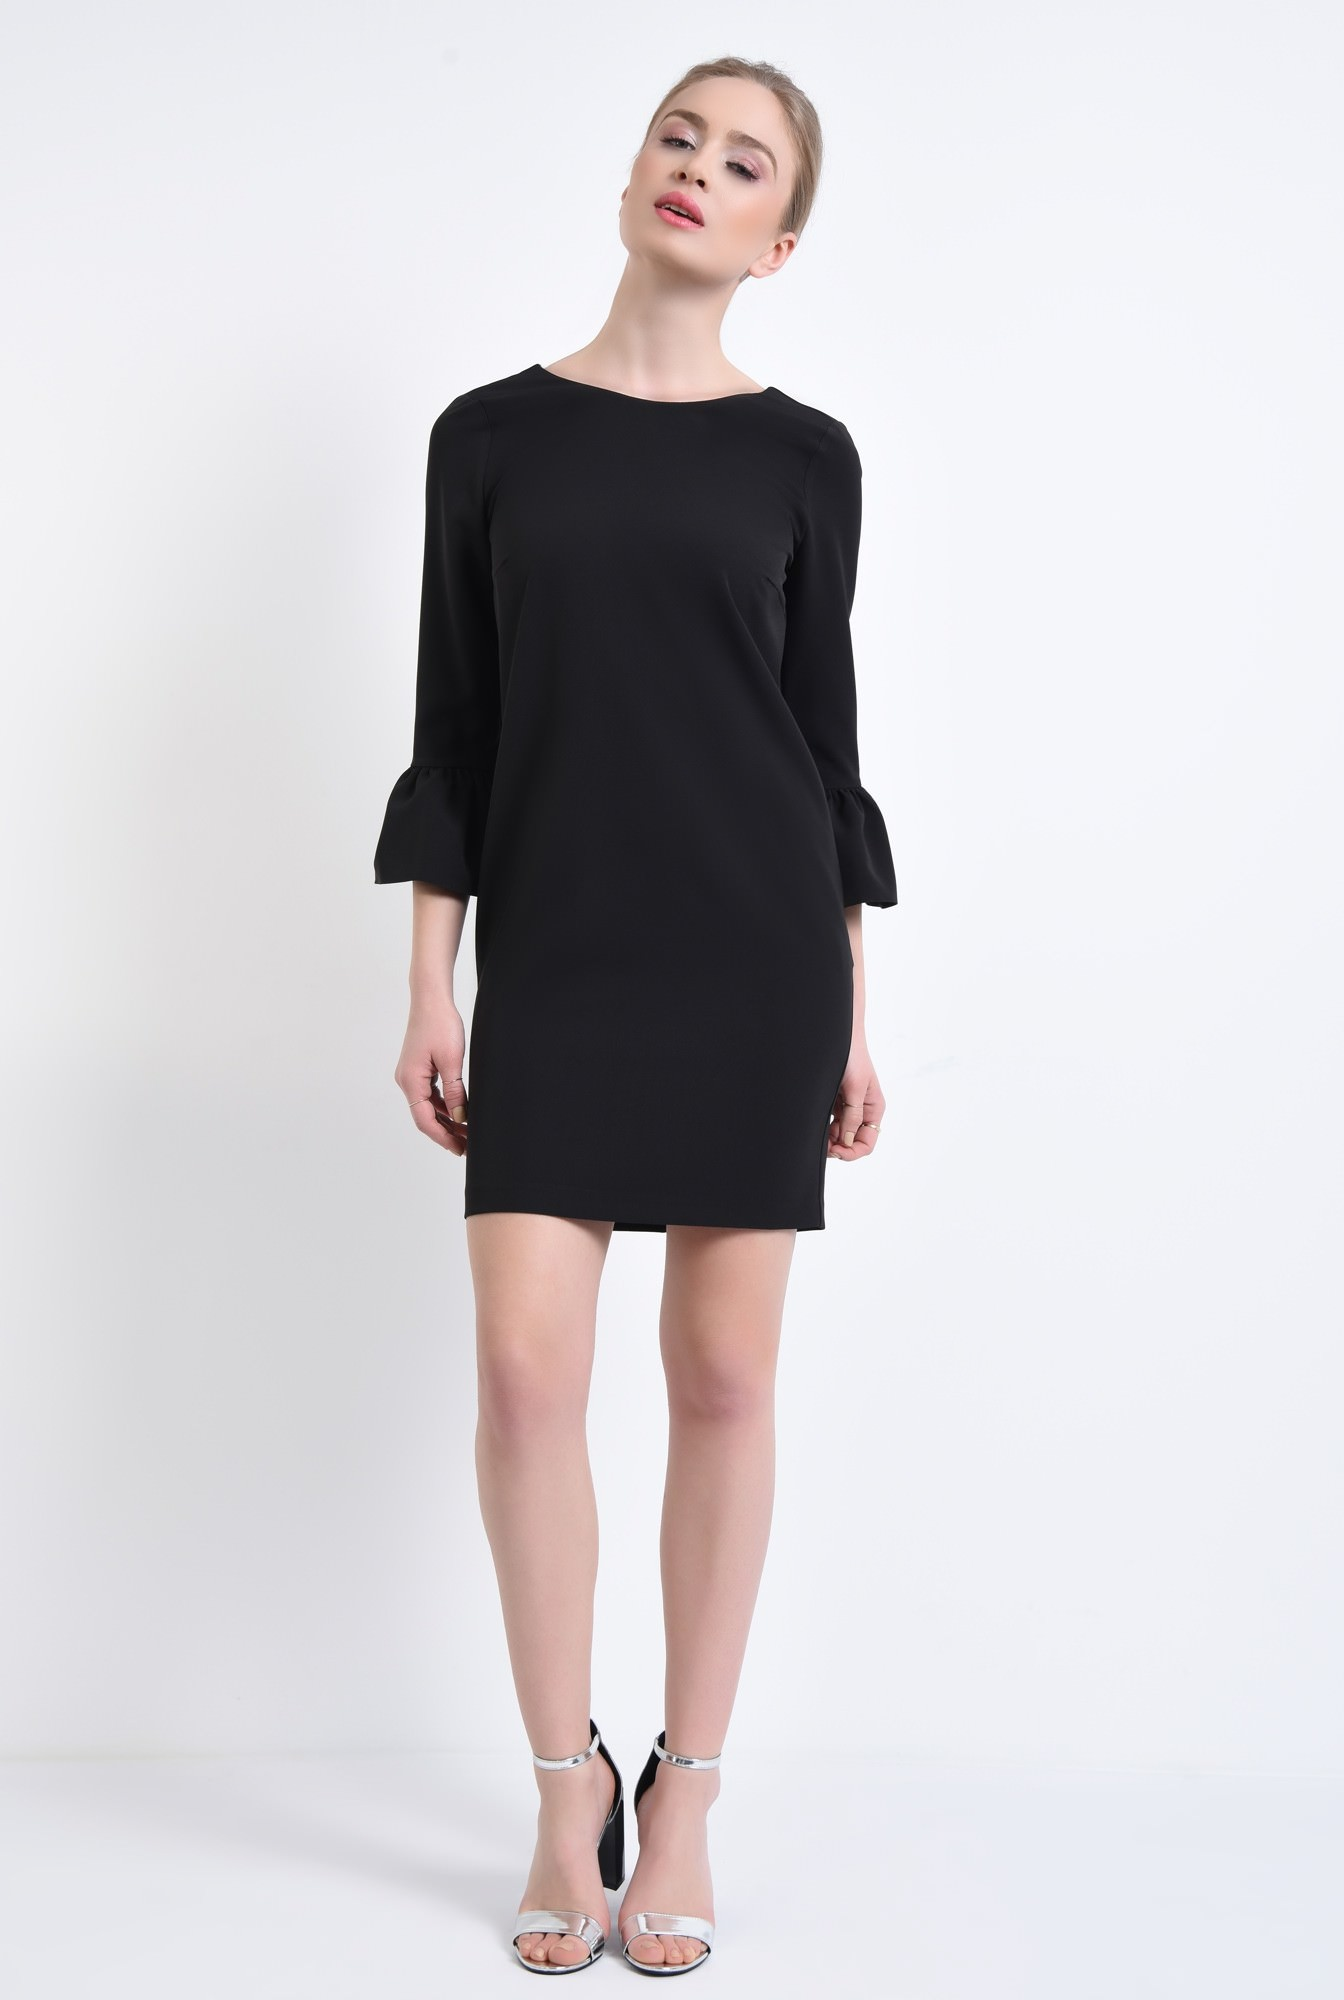 3 - Rochie eleganta neagra